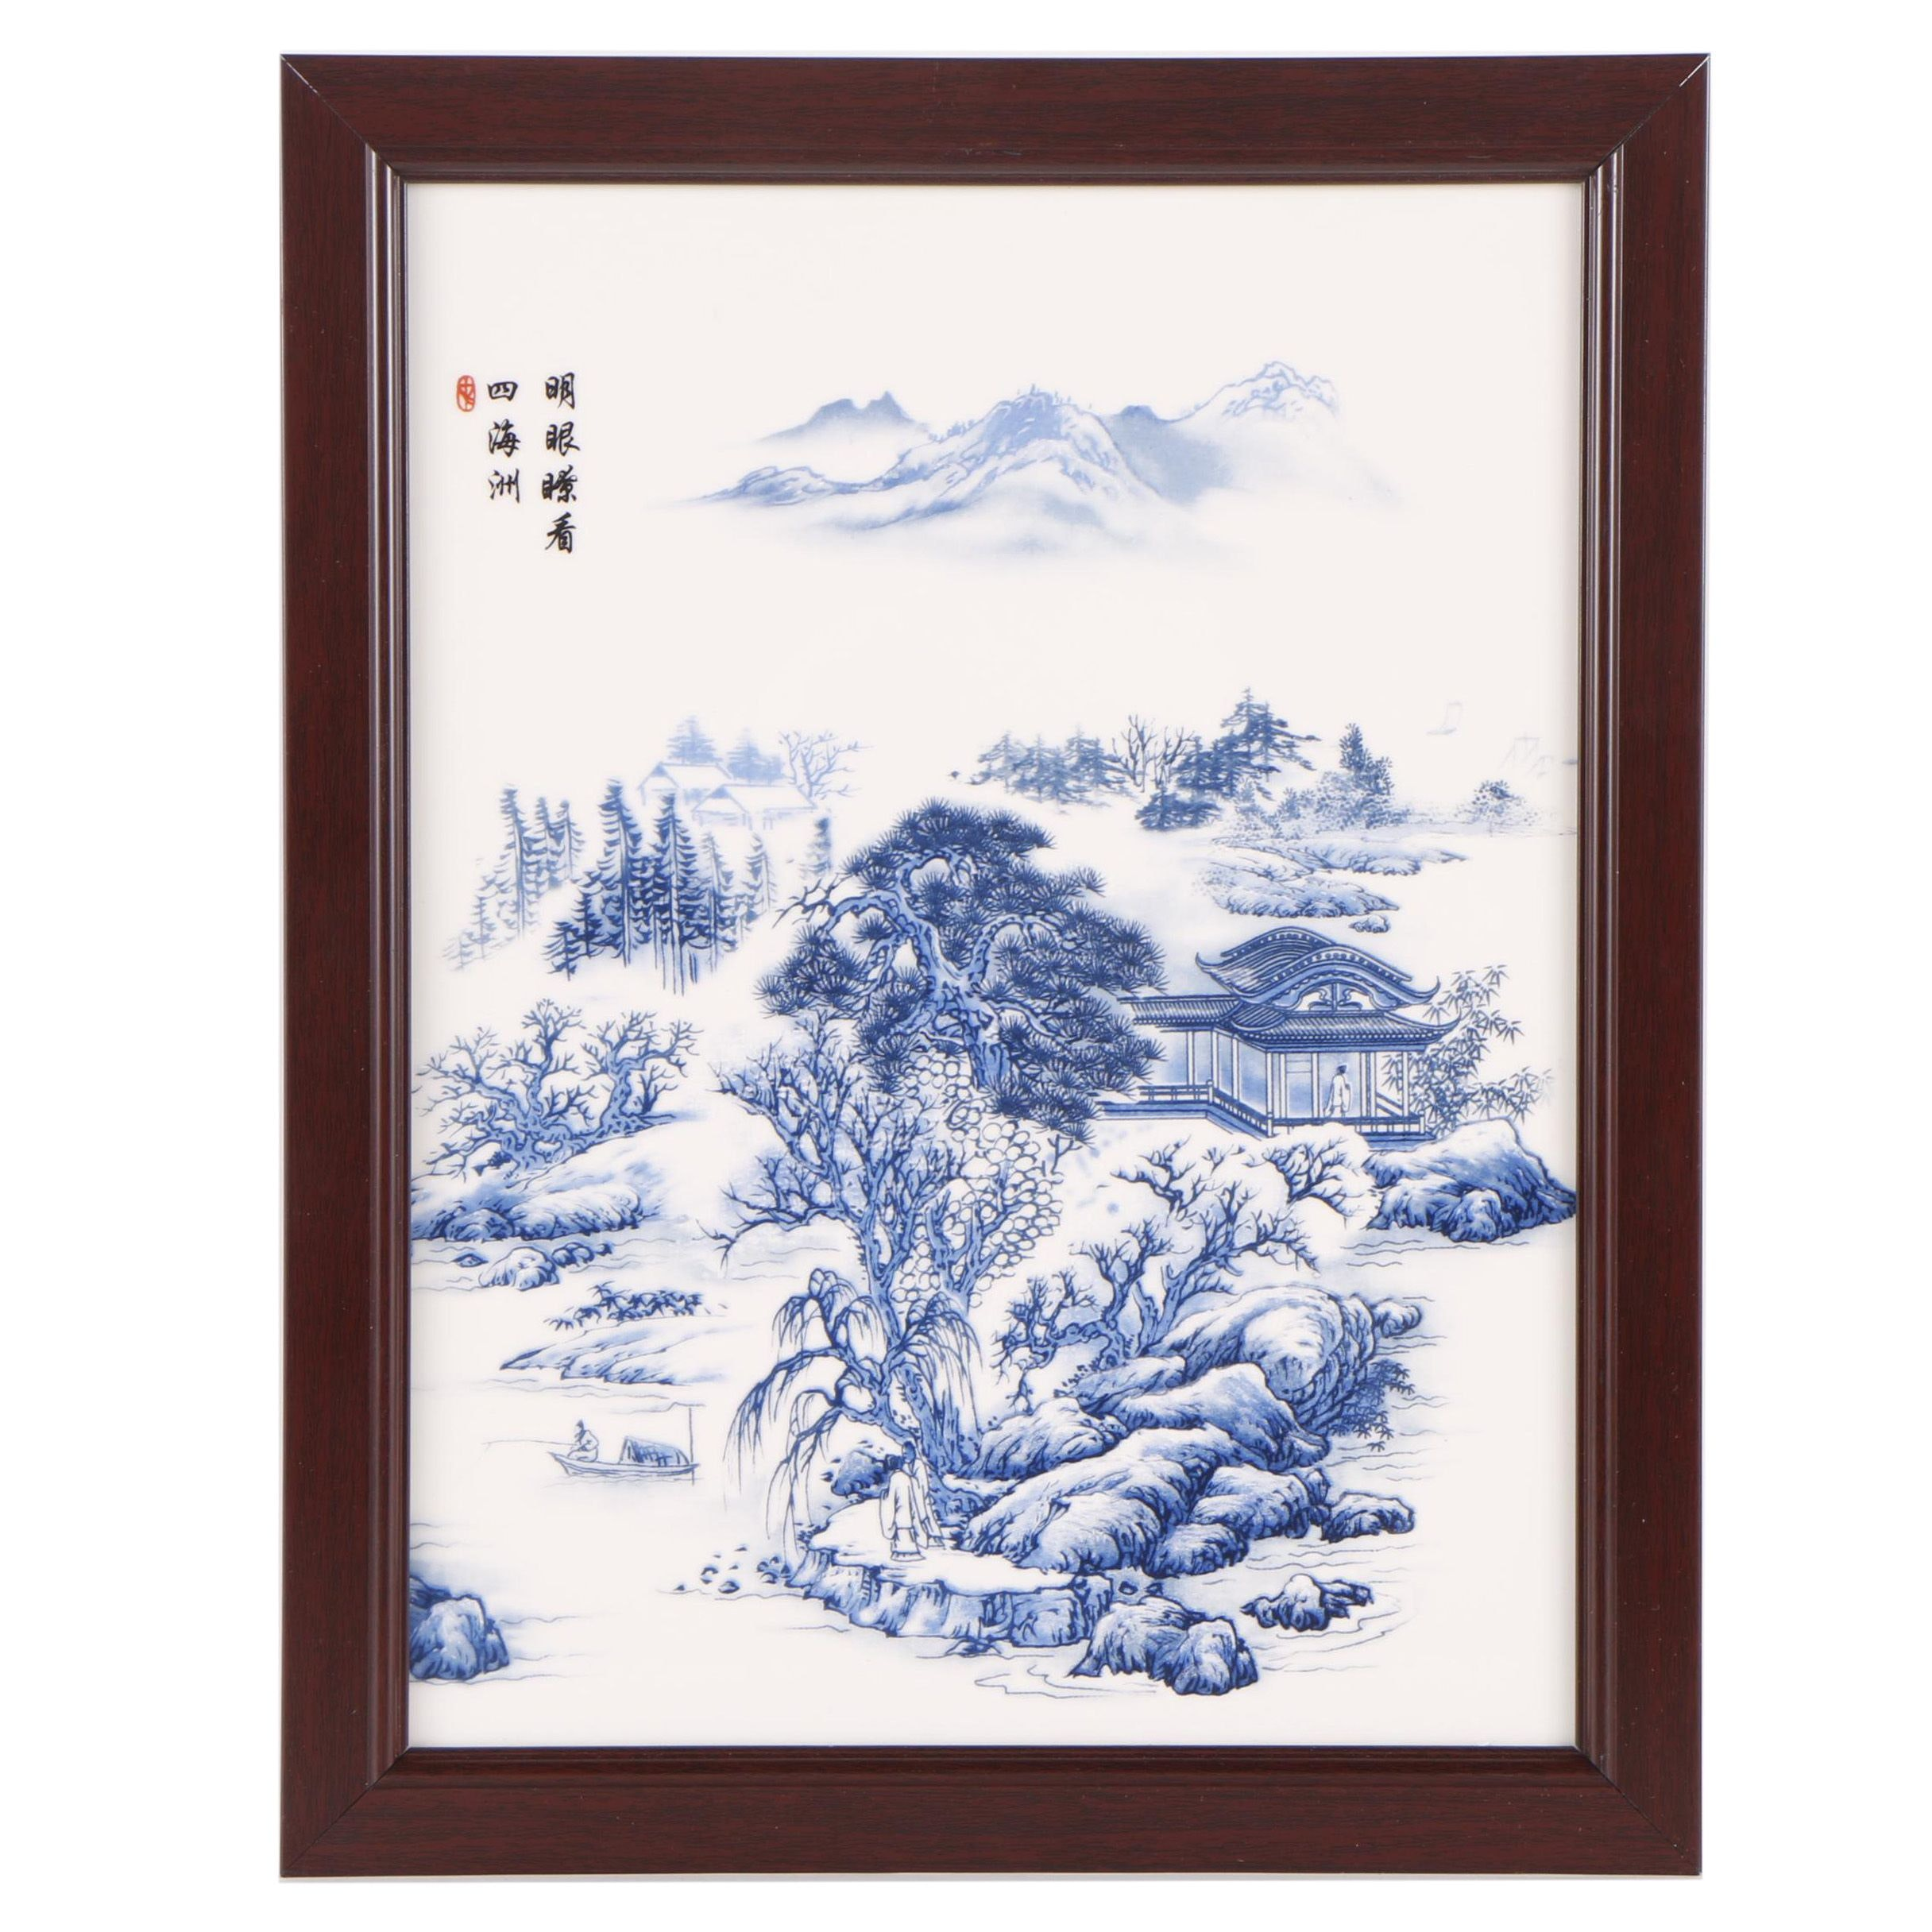 Chinese Ceramic Transferware Plaque of a Mountainous Landscape Scene